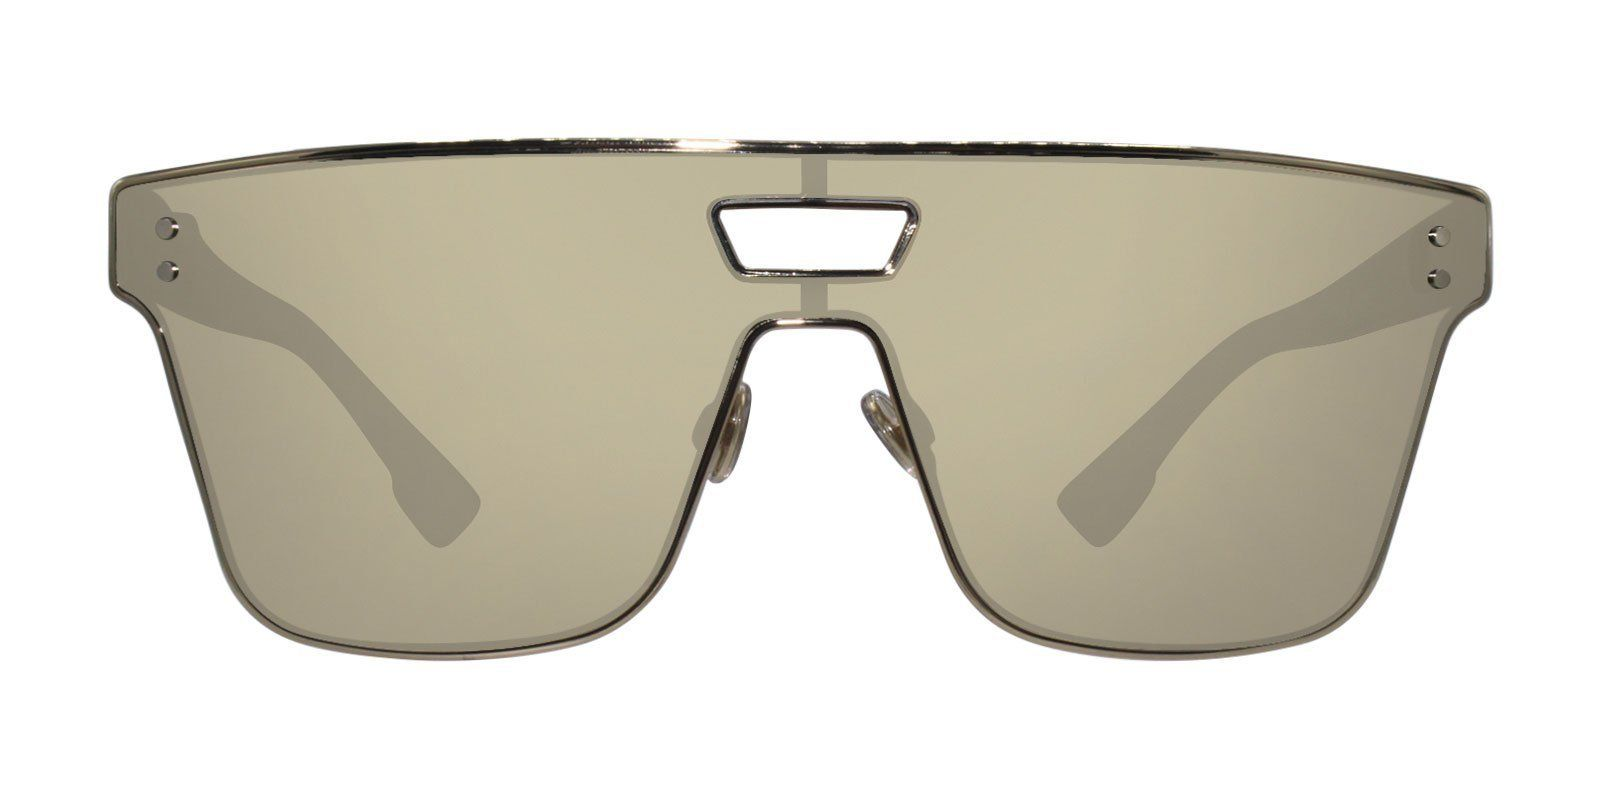 25ad8b9b878 Dior - Diorizonl Gold Black - Gold sunglasses in 2018